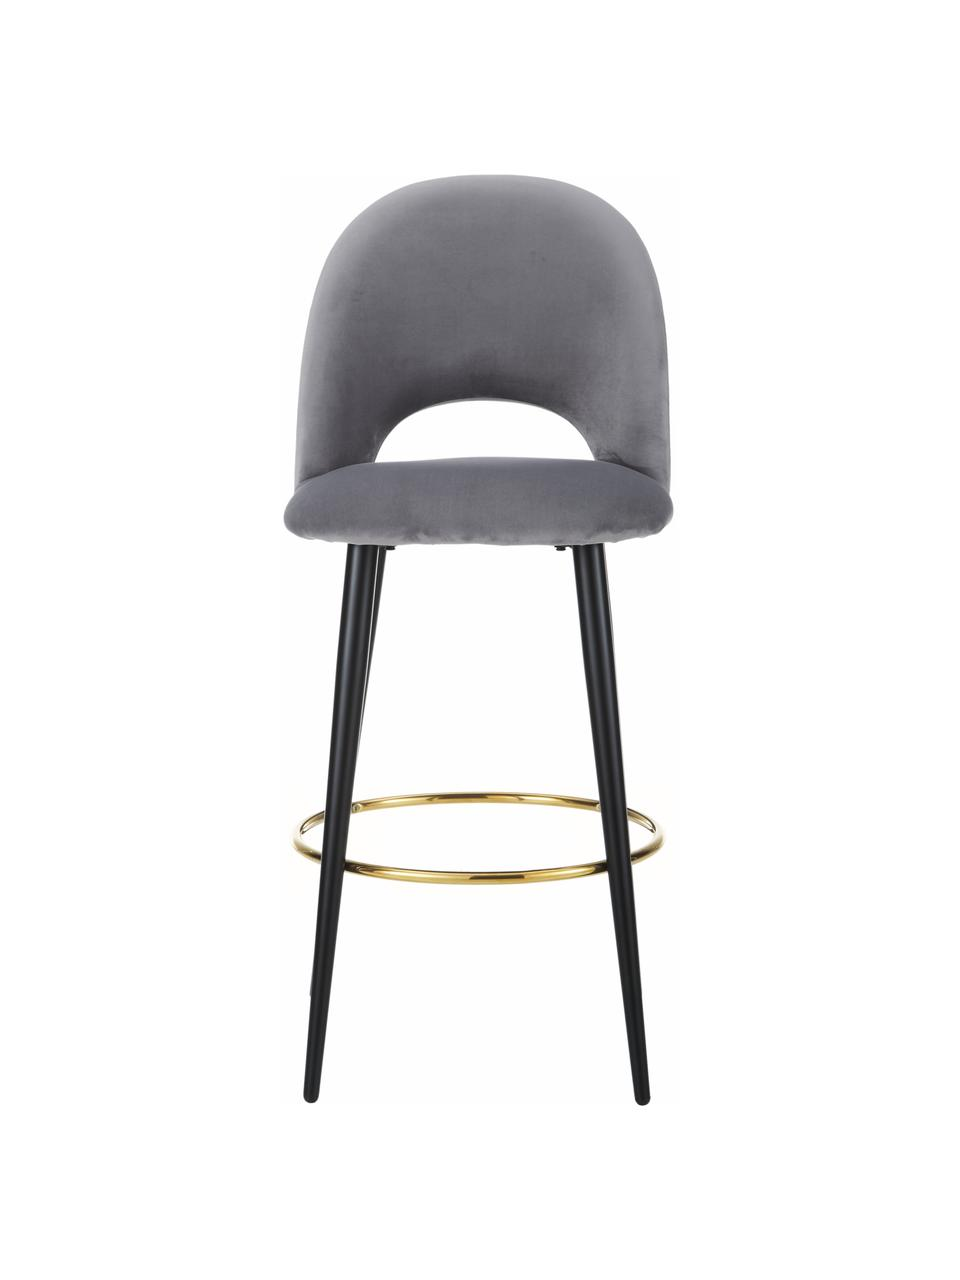 Sedia da bar in velluto grigio Rachel, Rivestimento: velluto (rivestimento in , Gambe: metallo verniciato a polv, Velluto grigio acciaio, Larg